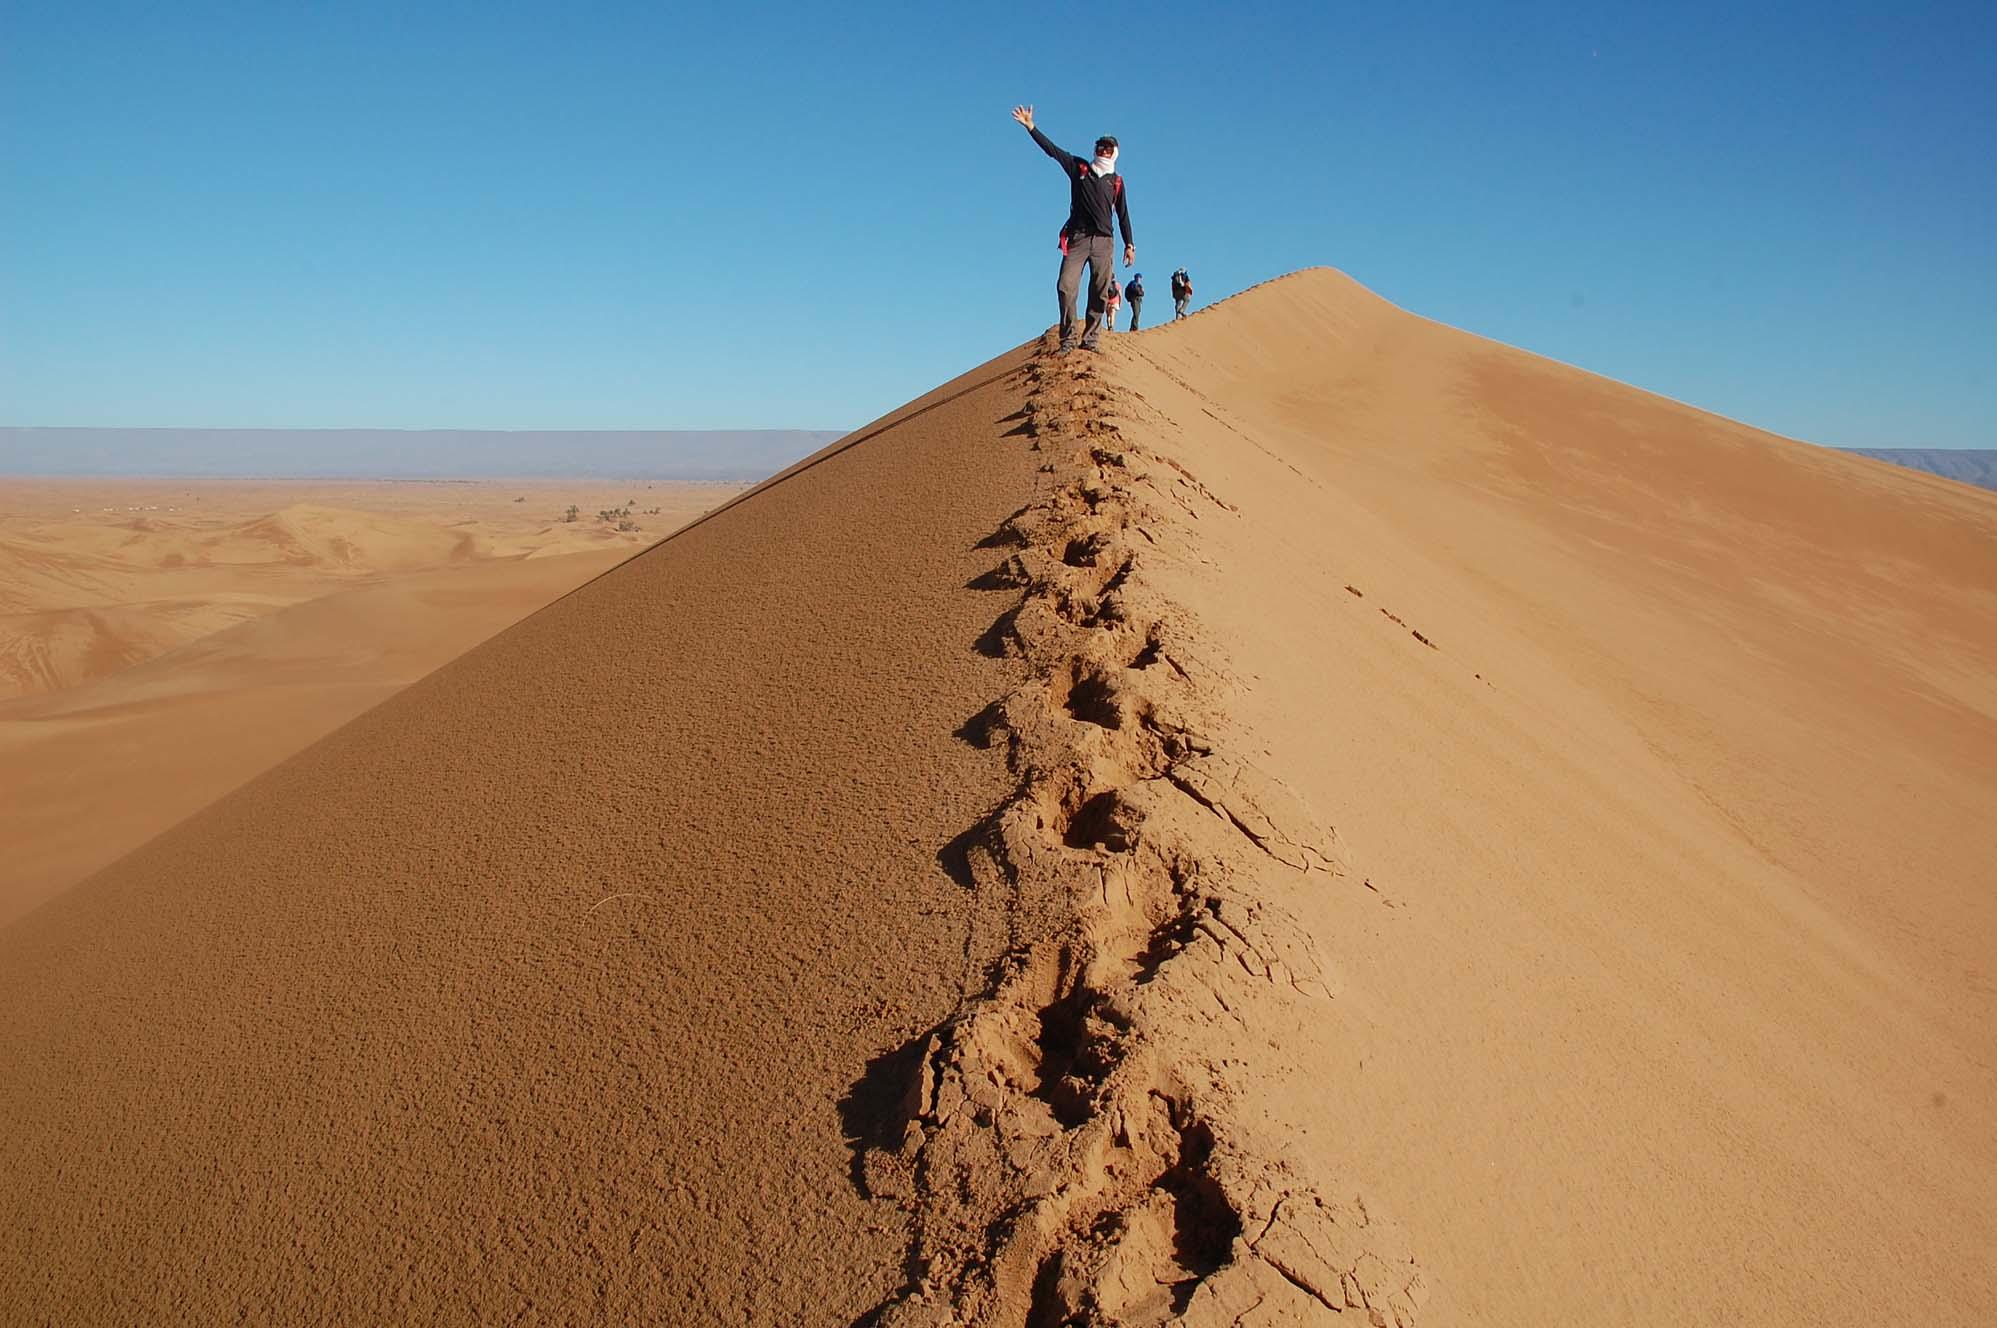 Trek The Sahara Desert With 360 Expeditions